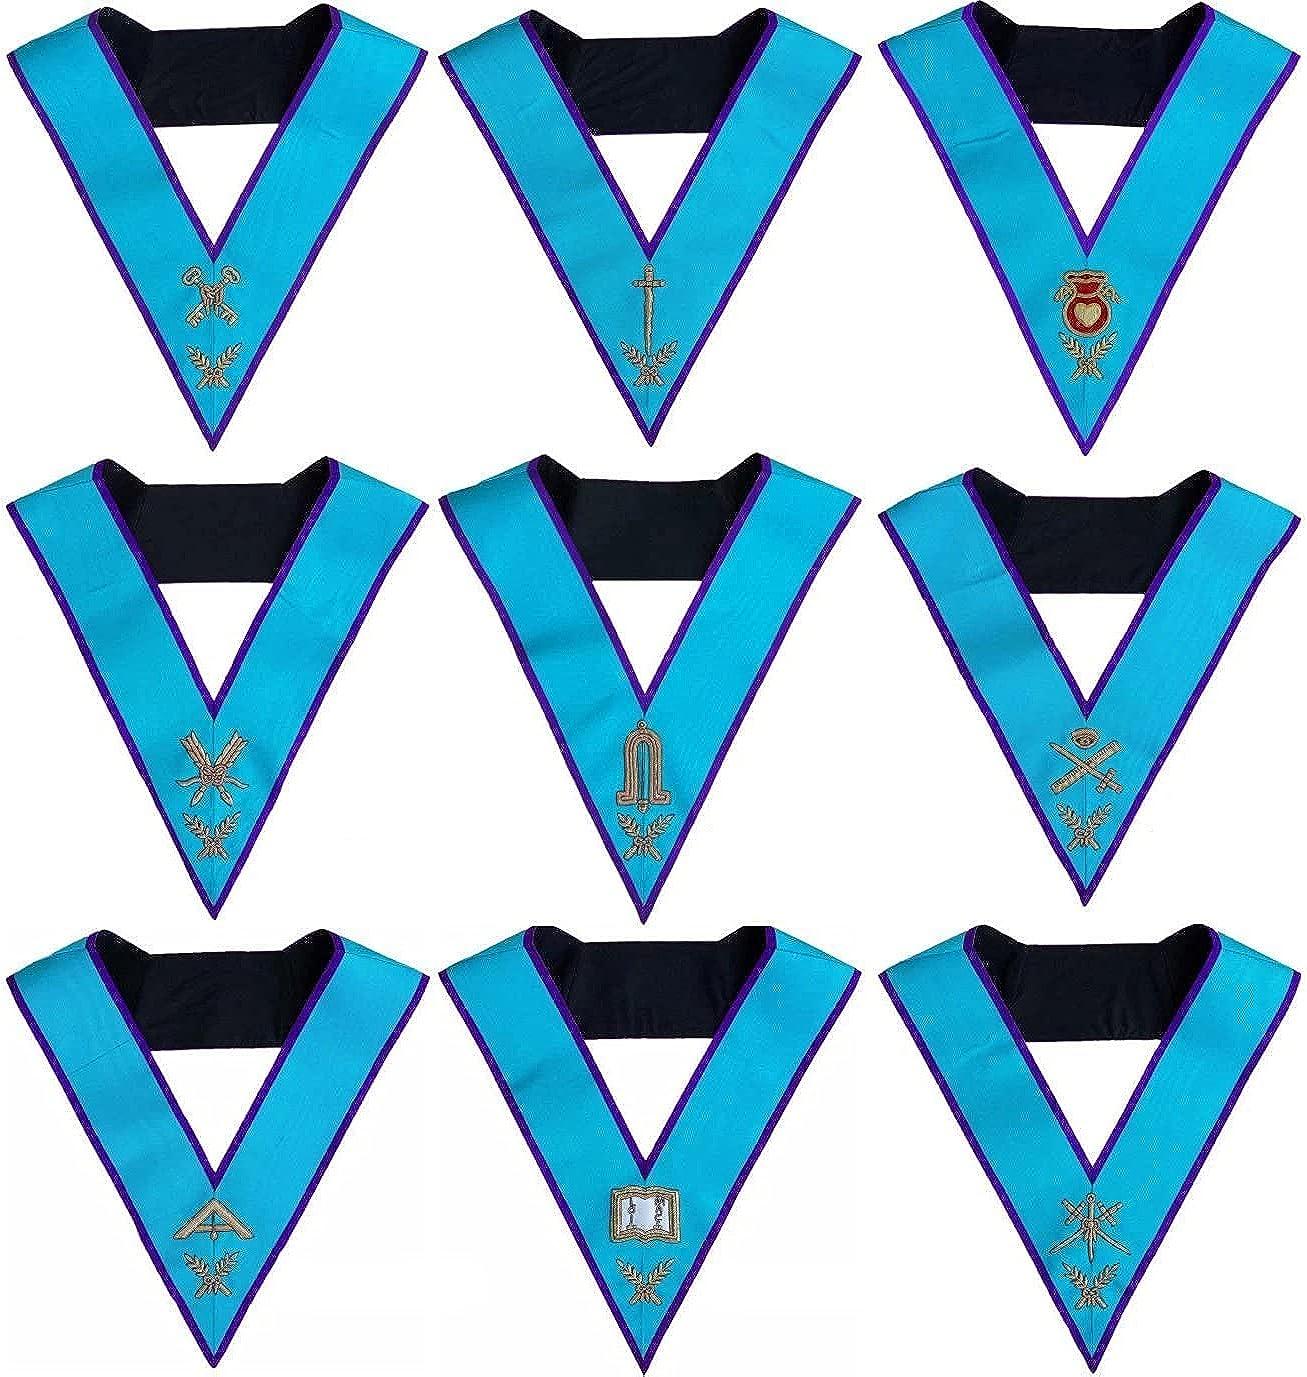 Masonic Memphis Misraim Officer Collars Set Of 9 Hand Embroidered